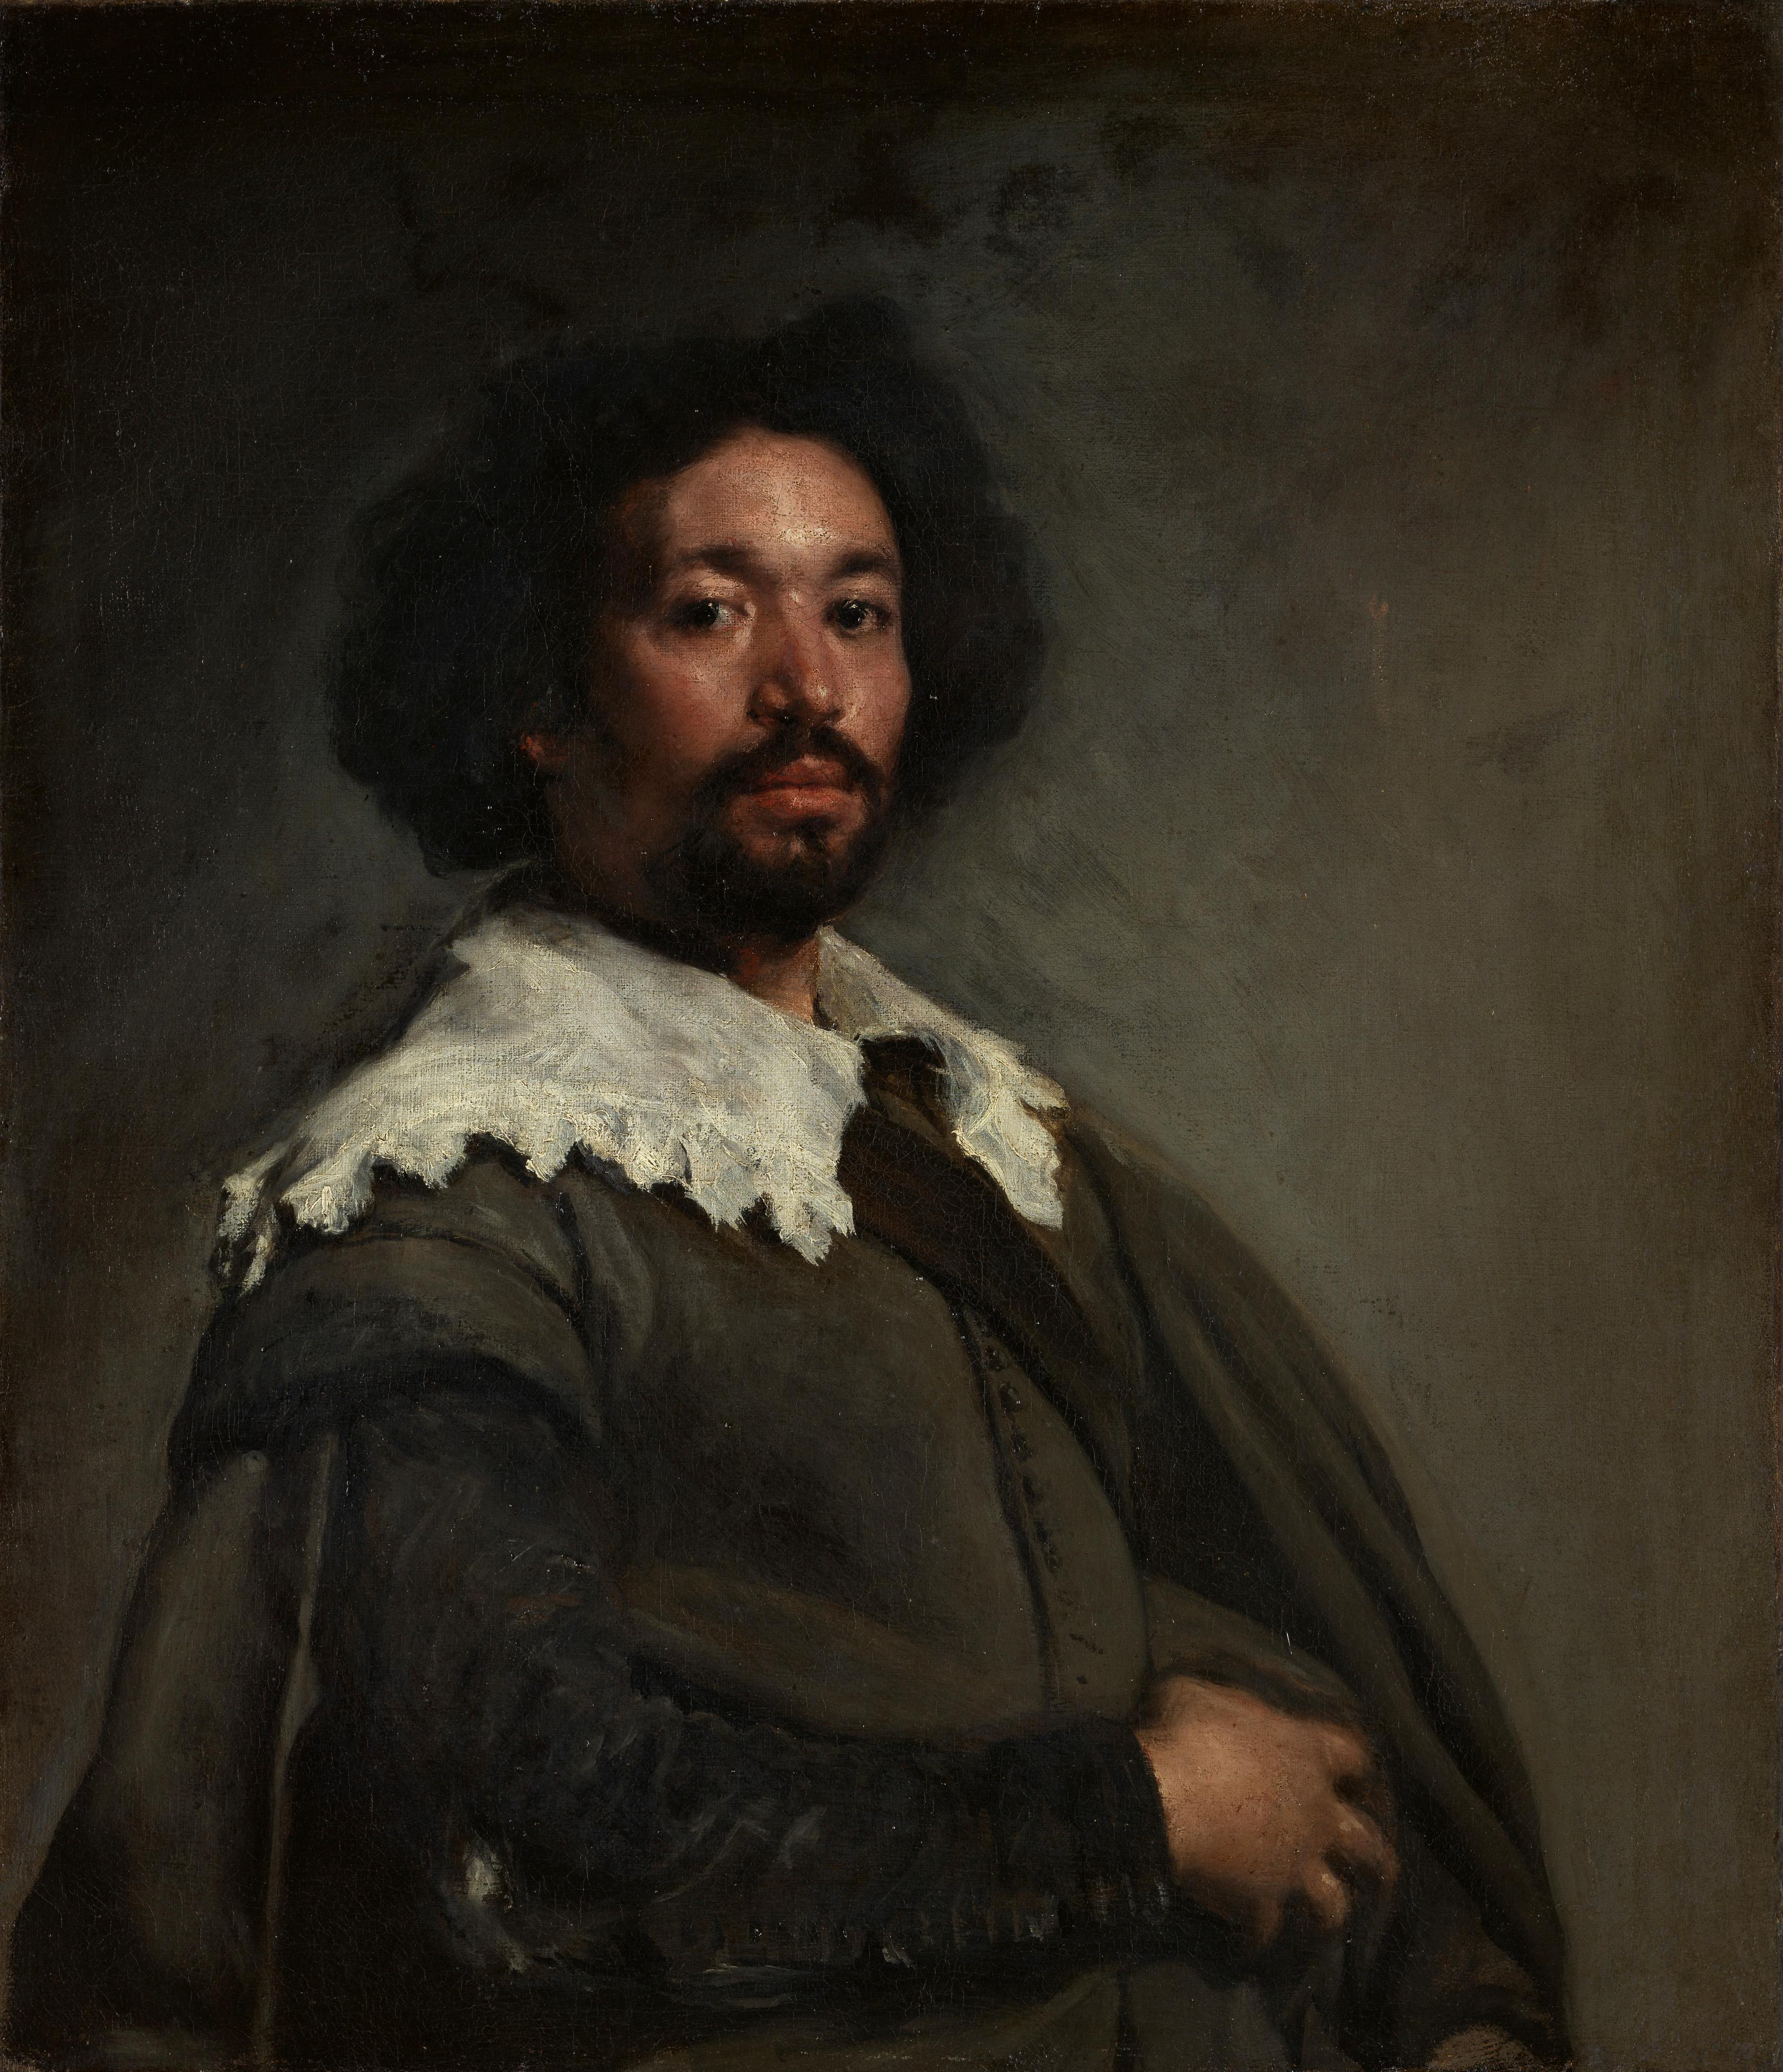 Juan de Pareja